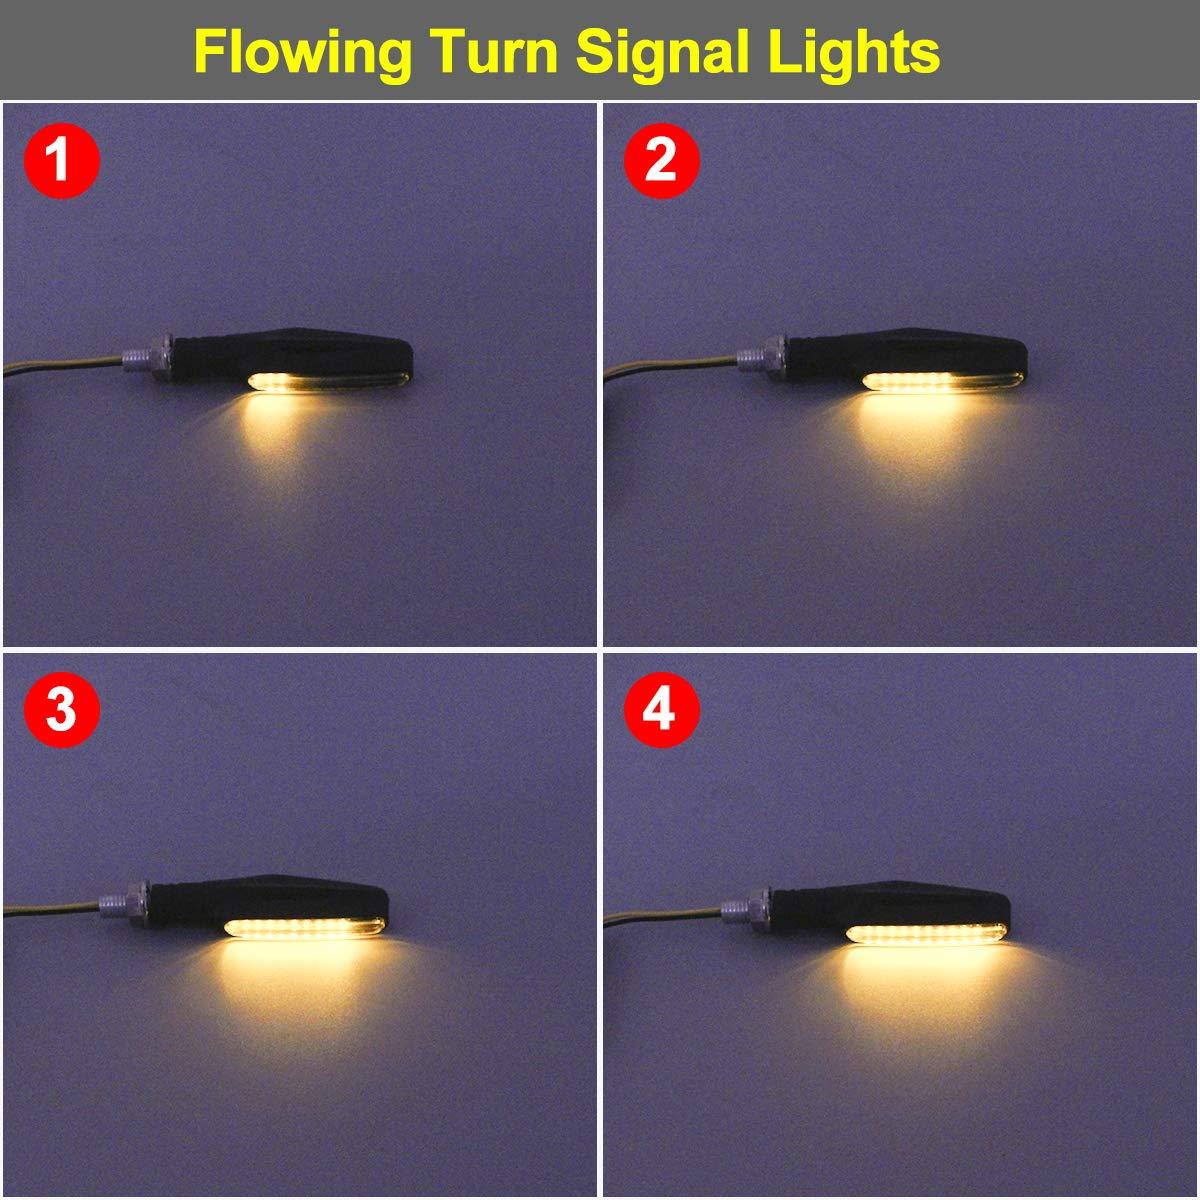 Upgraded 4Pcs Motorcycle Flowing Turn Signal Lights Universal Motorbike LED Turning Indicators Lamp Amber Light KING SHOWDEN